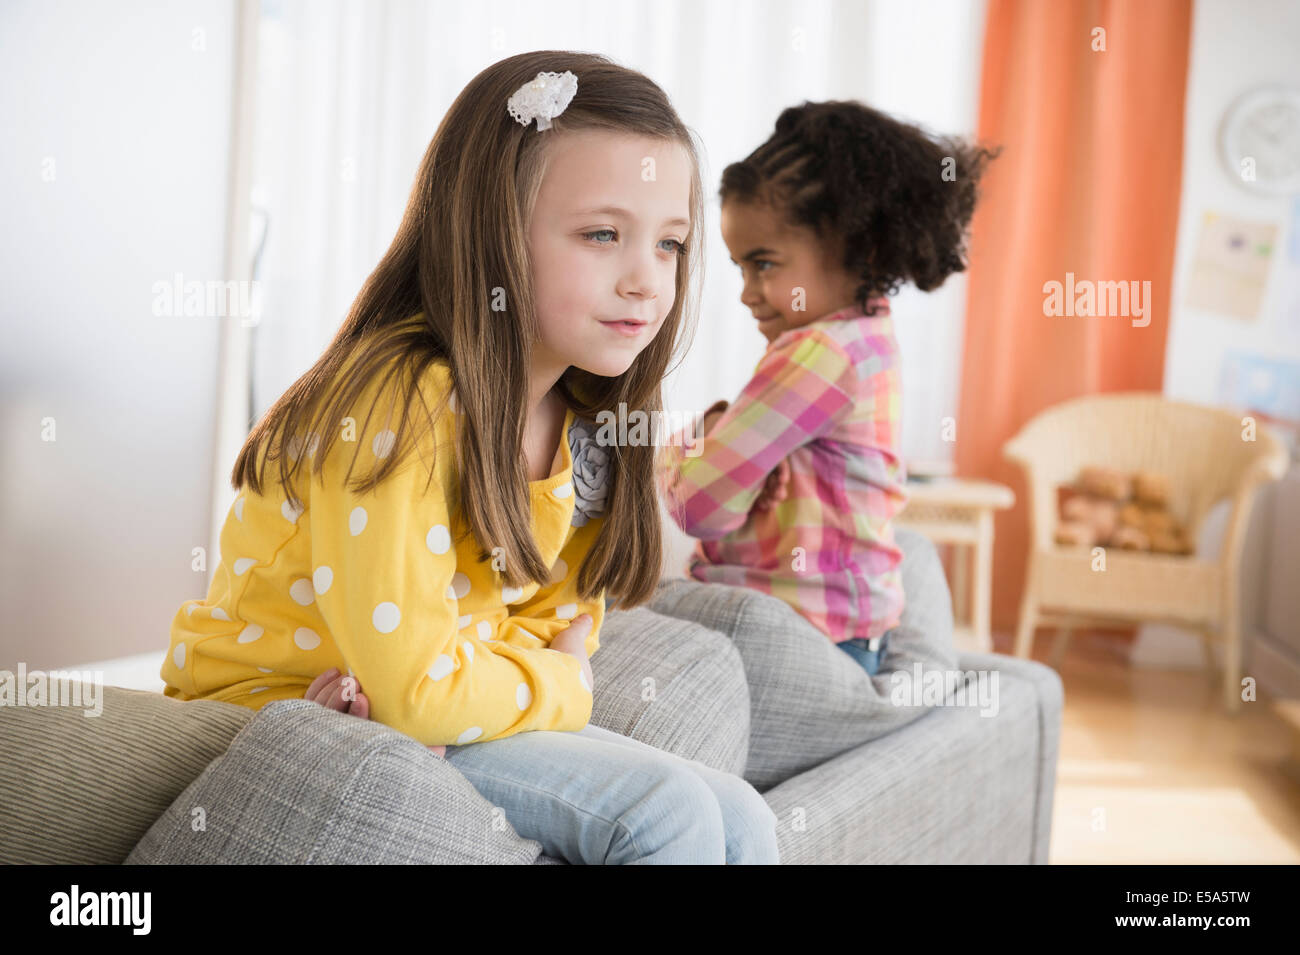 Girls fighting on sofa Stock Photo